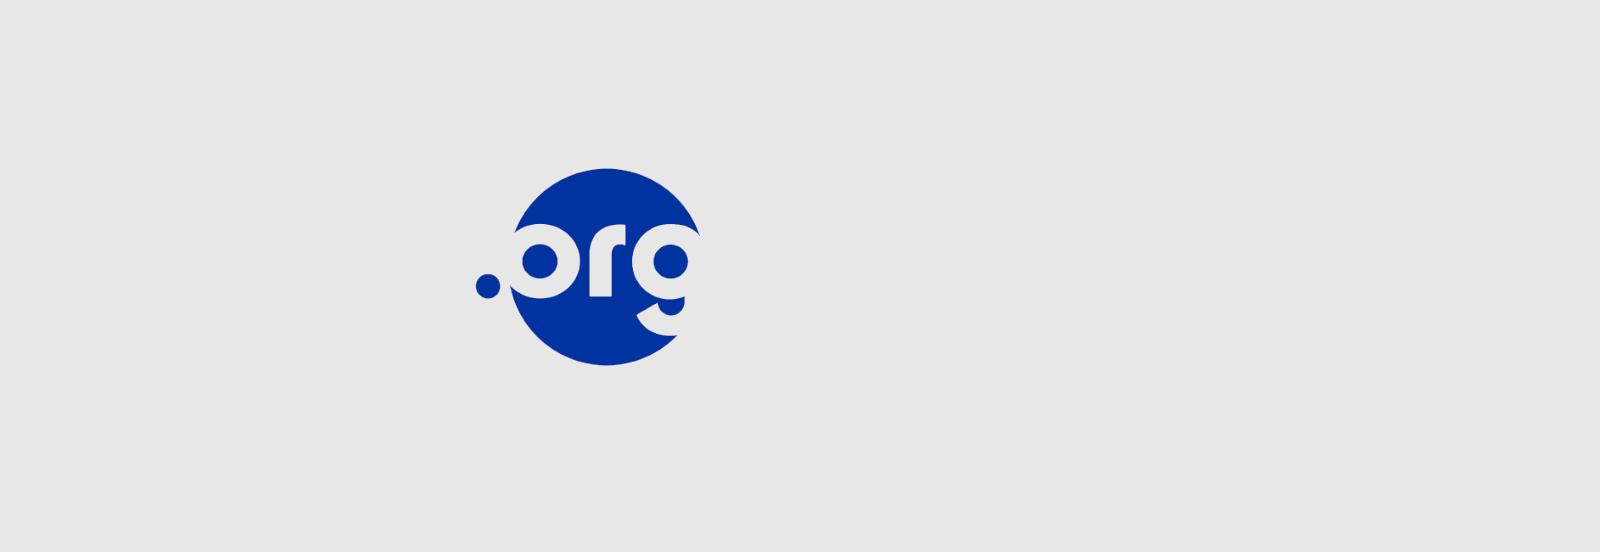 El logo de .org sobre fondo gris